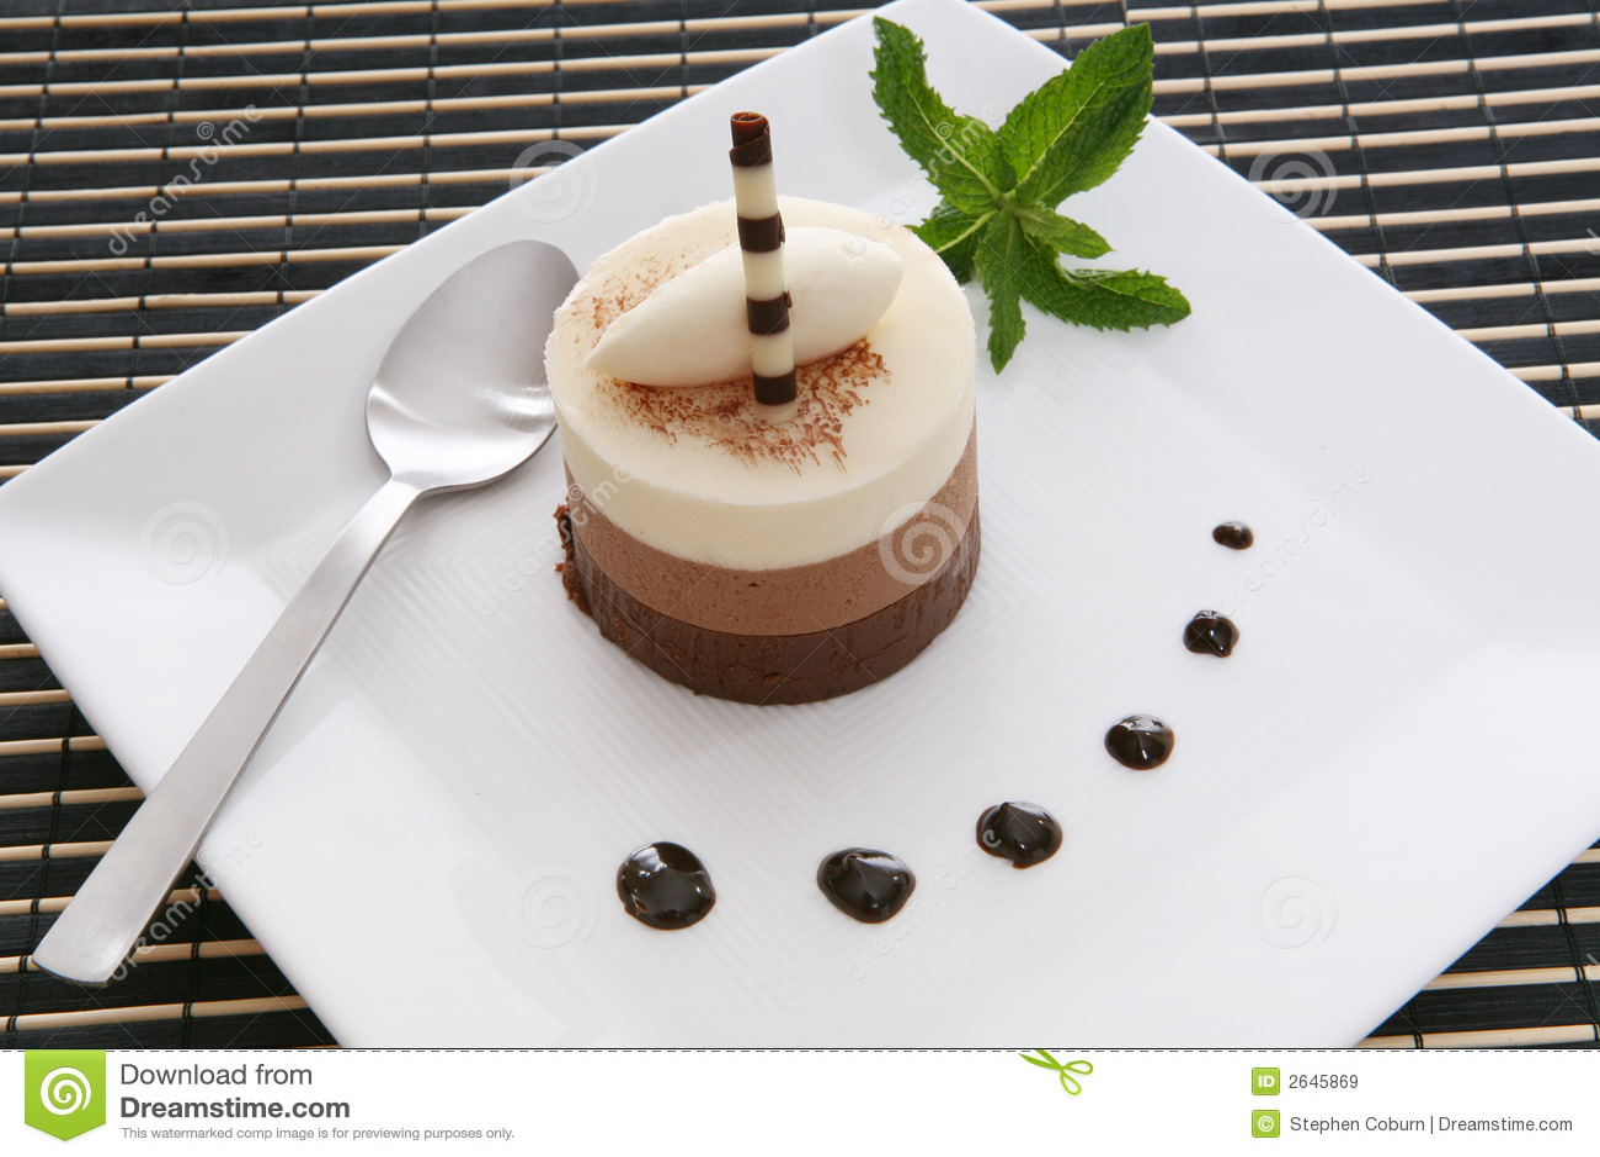 Cake Dessert Royalty Free Stock Images - Image: 2645869